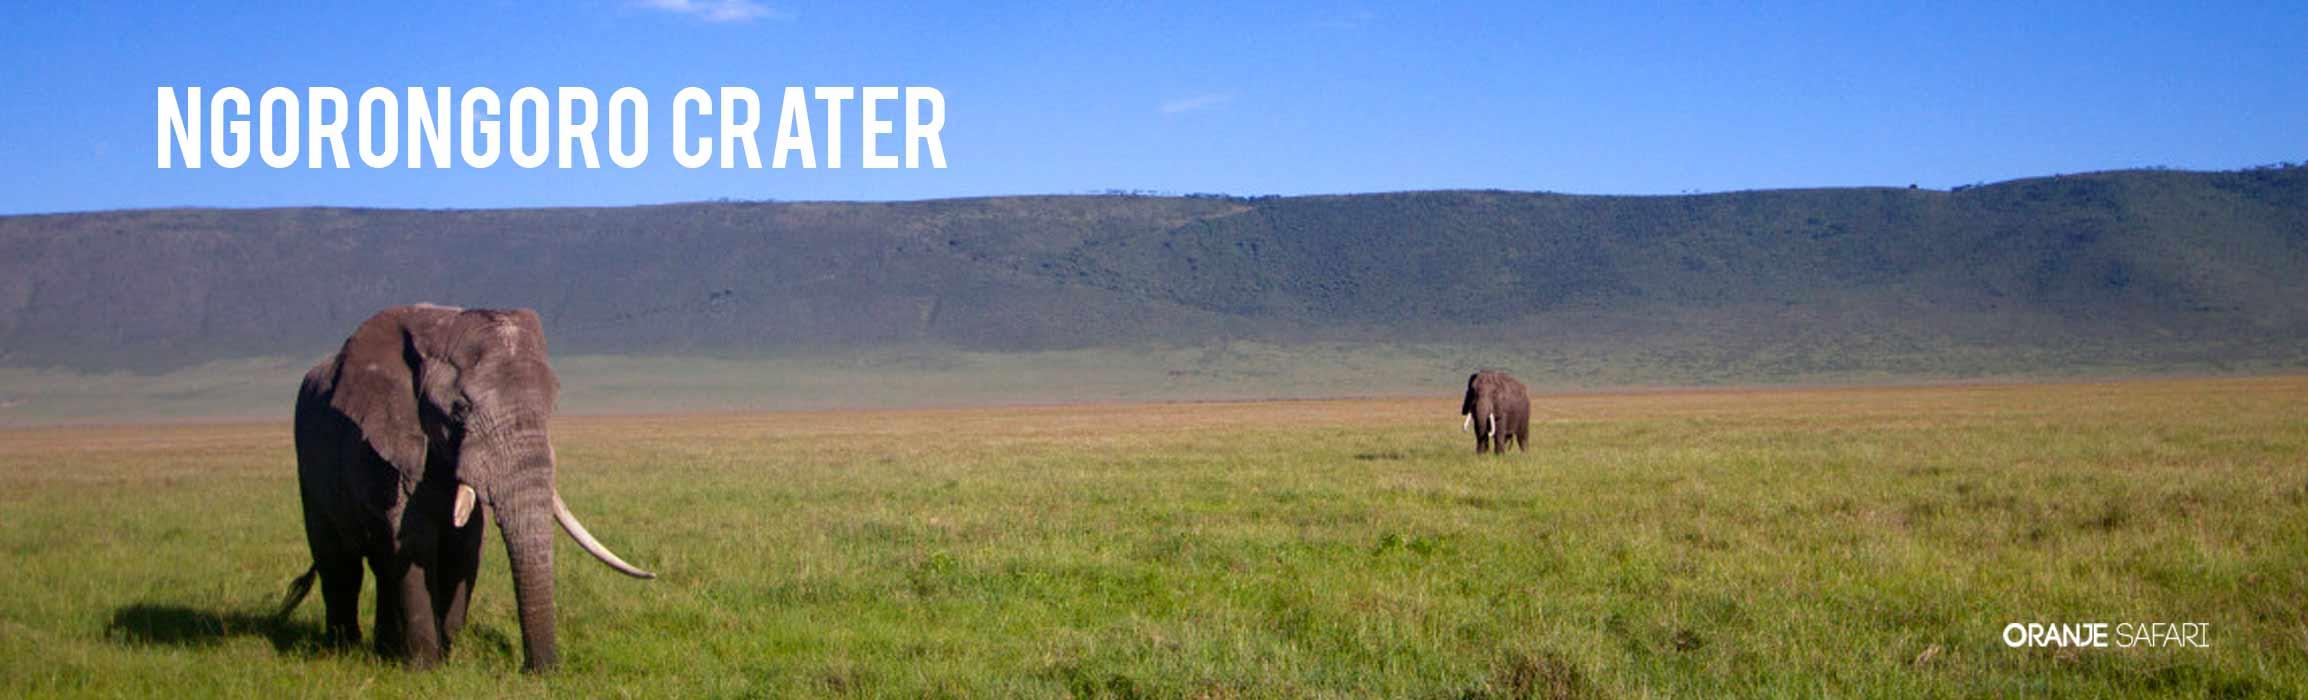 Ngorongoro Crater Safari Tanzania Tours Oranje Safari